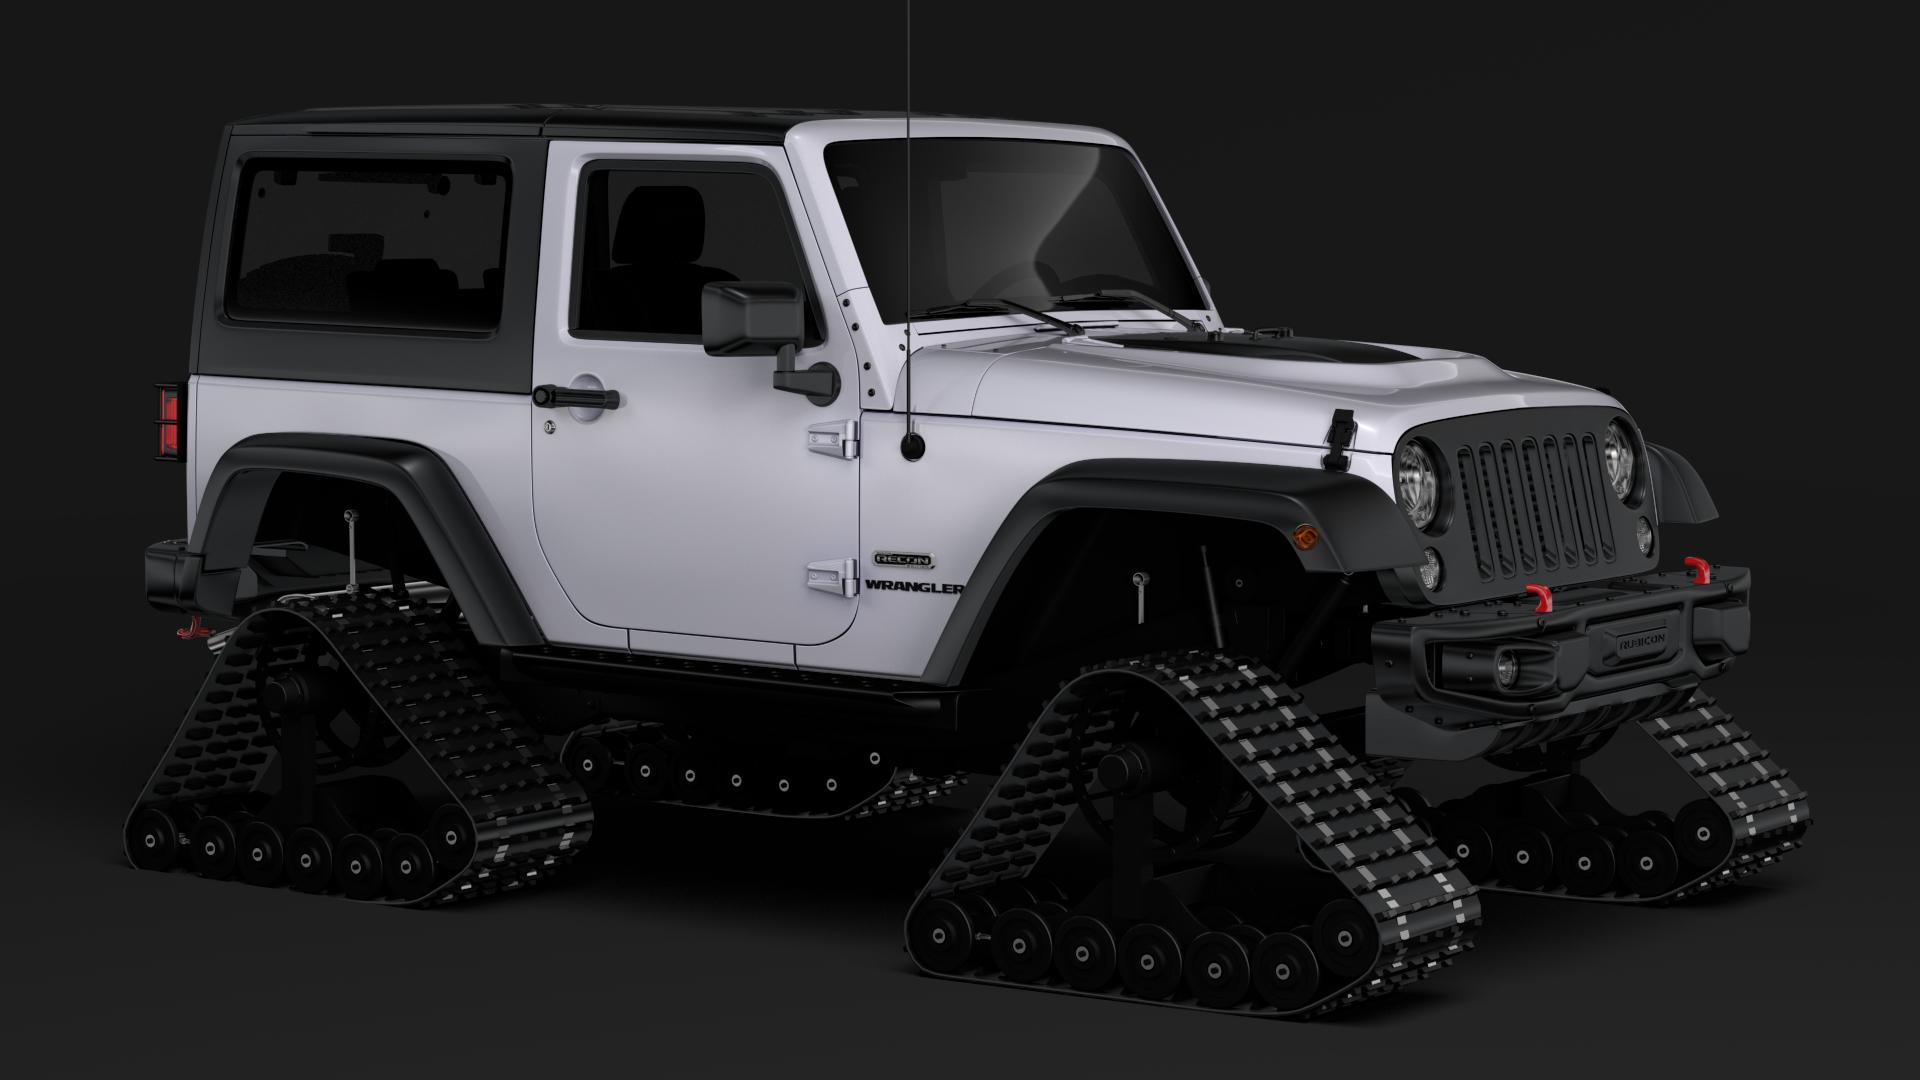 jeep wrangler crawler rubicon recon jk 2017 3d model max fbx c4d lwo ma mb hrc xsi obj 276910